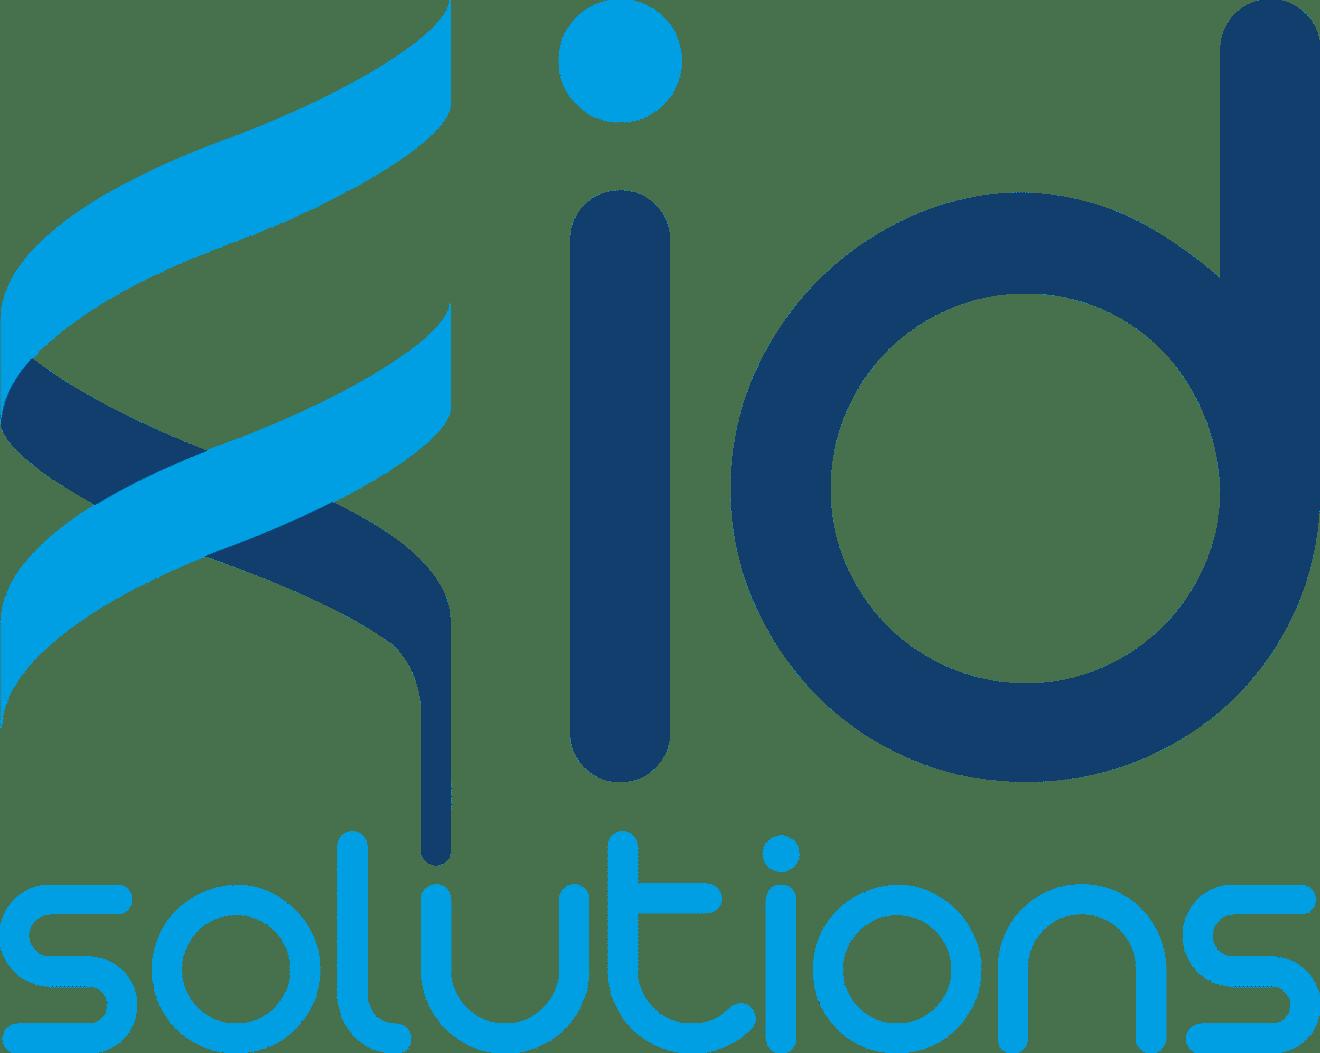 LOGO ID solutions - Copie